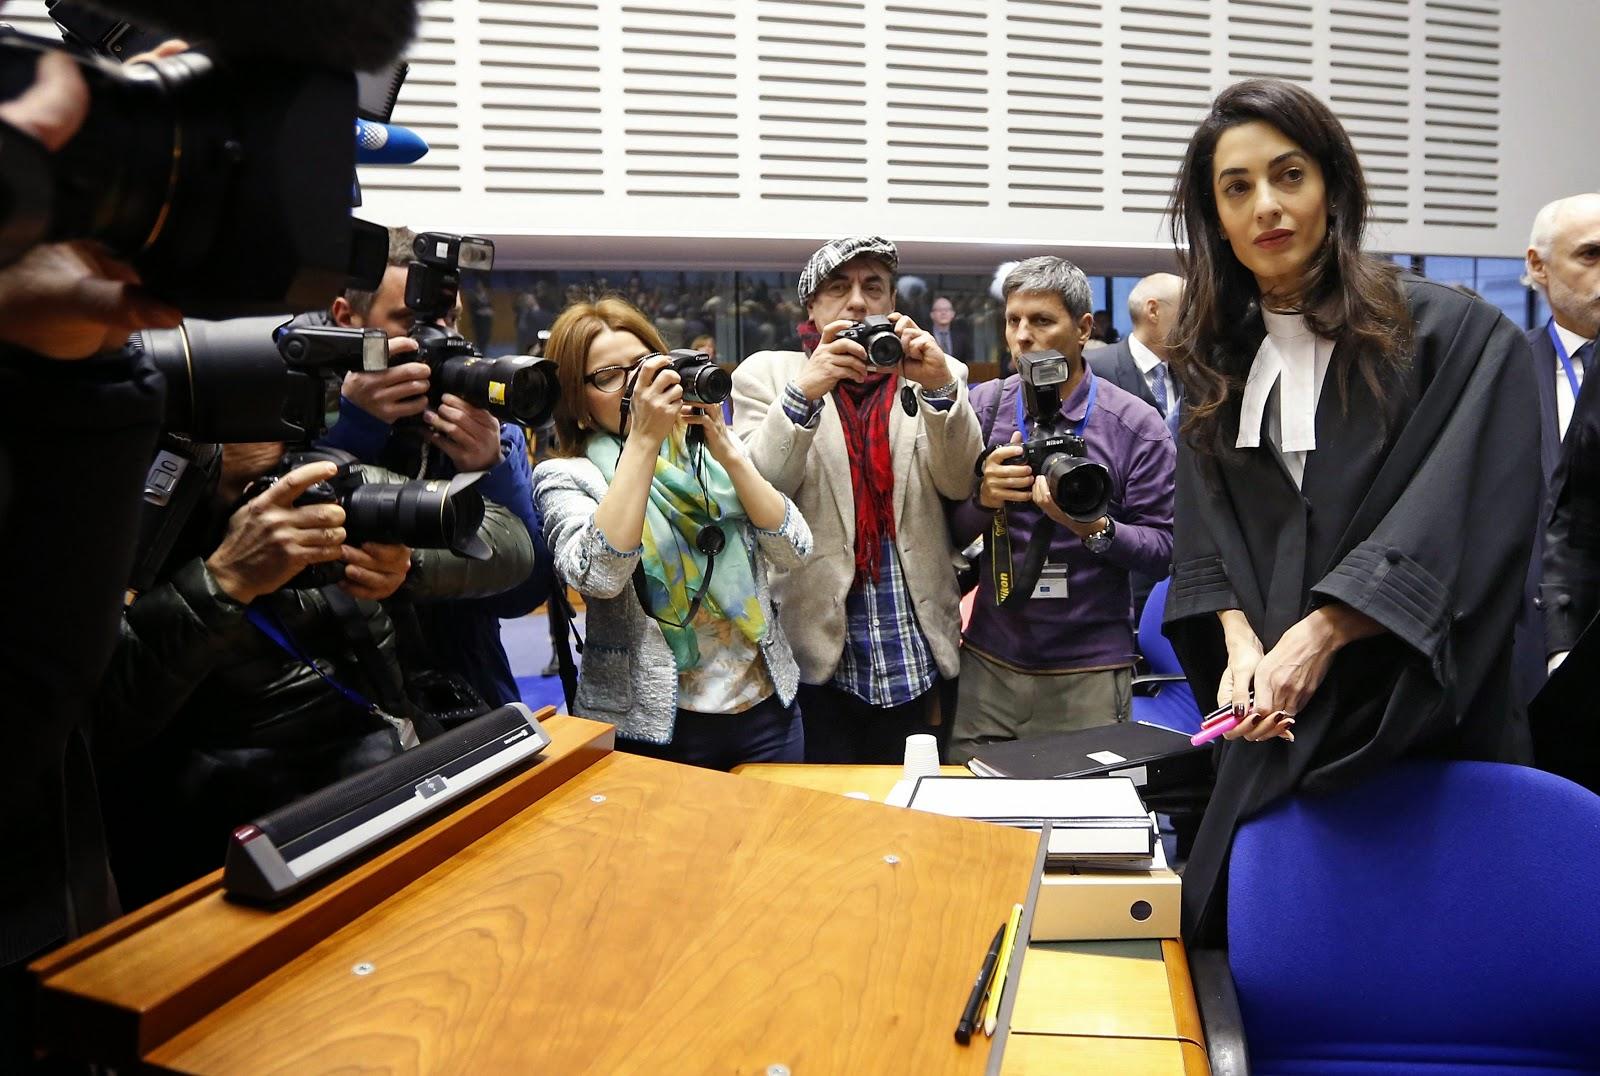 H Αμάλ Κλούνεϊ κατά της Τουρκίας για τη Γενοκτονία στο Ευρωπαϊκό Δικαστήριο Ανθρωπίνων Δικαιωμάτων